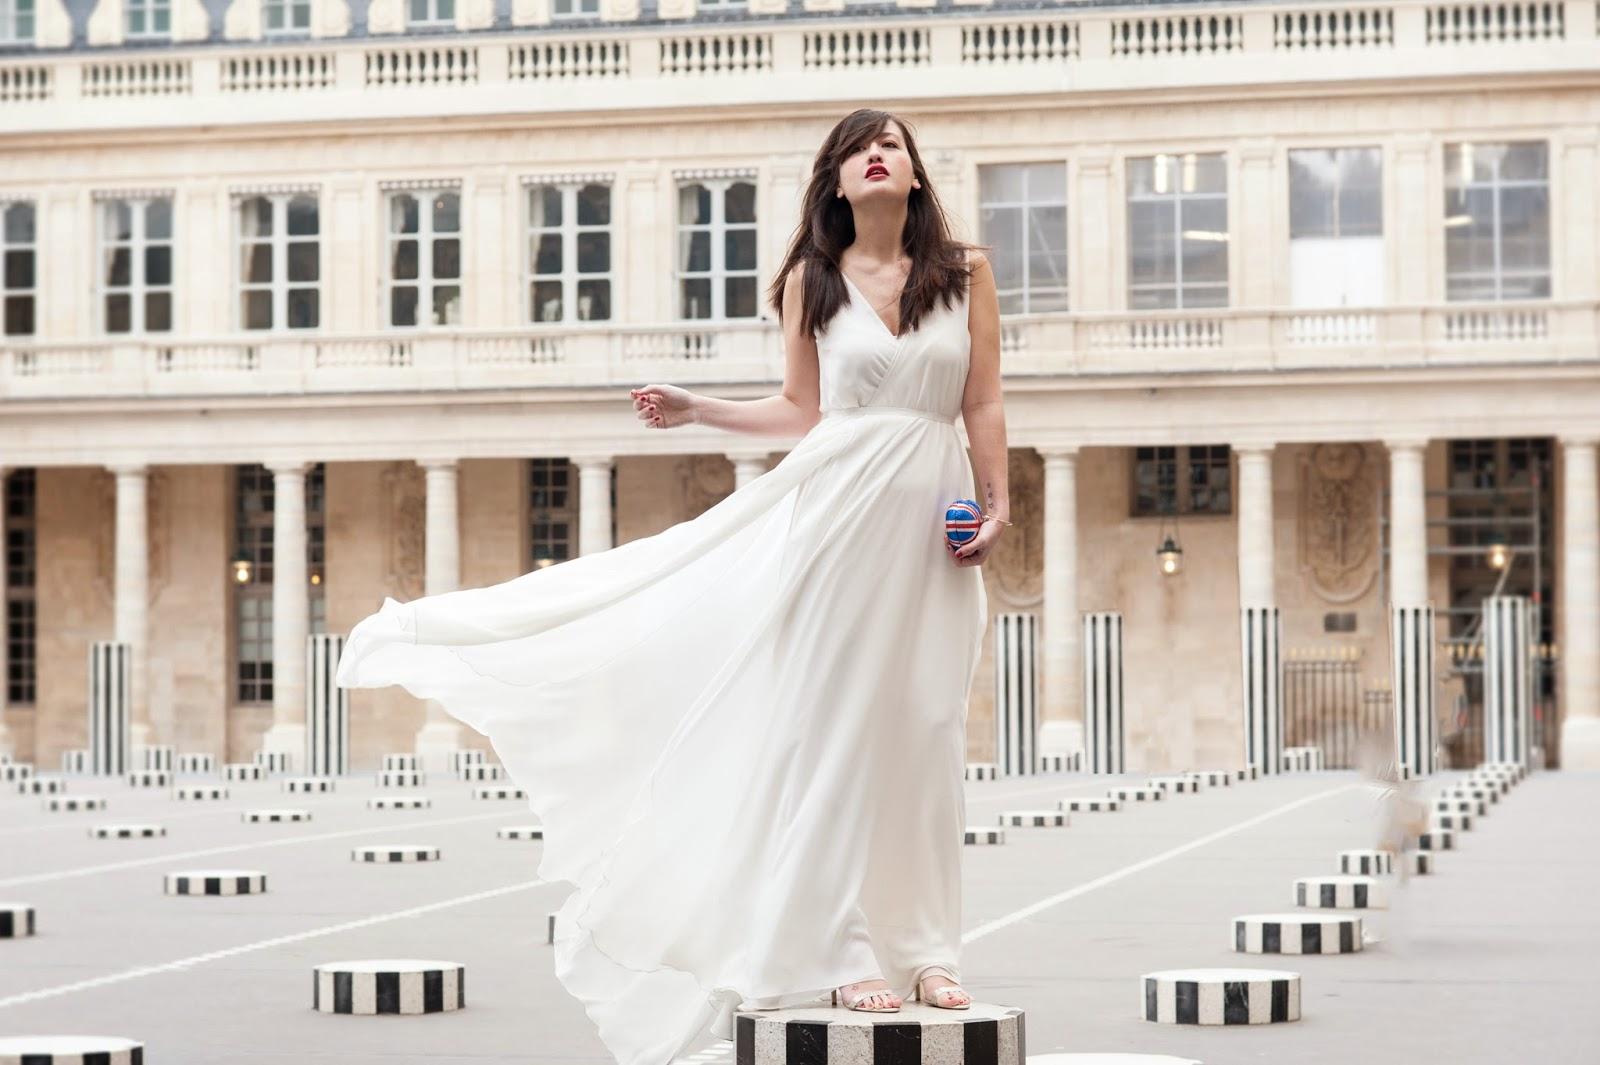 Sophie bas dress